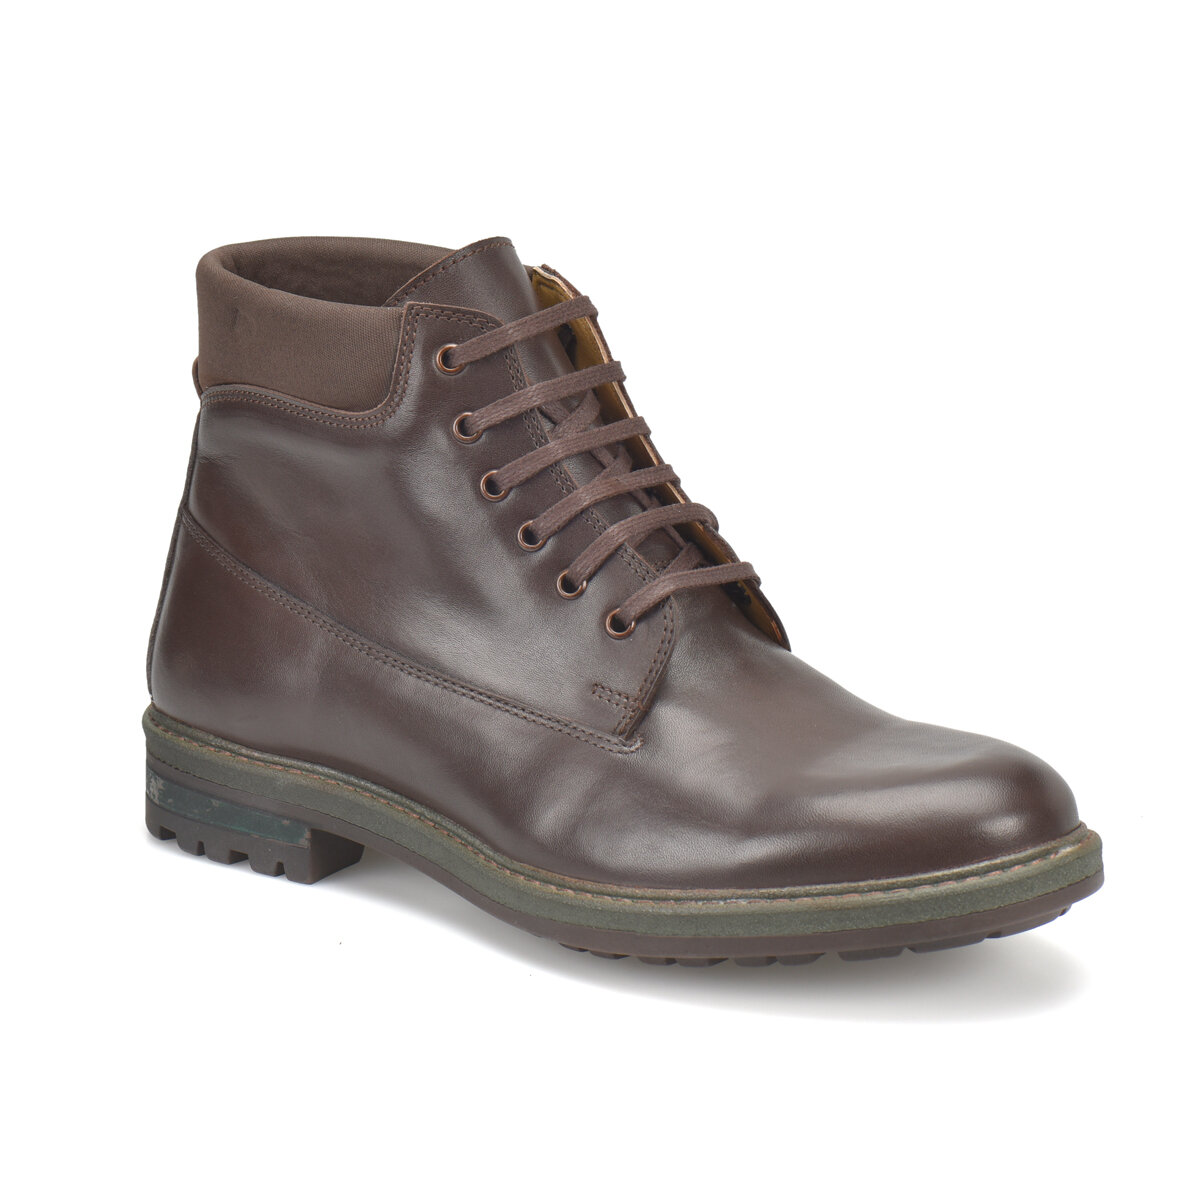 FLO 4211 Brown Men Boots Garamond